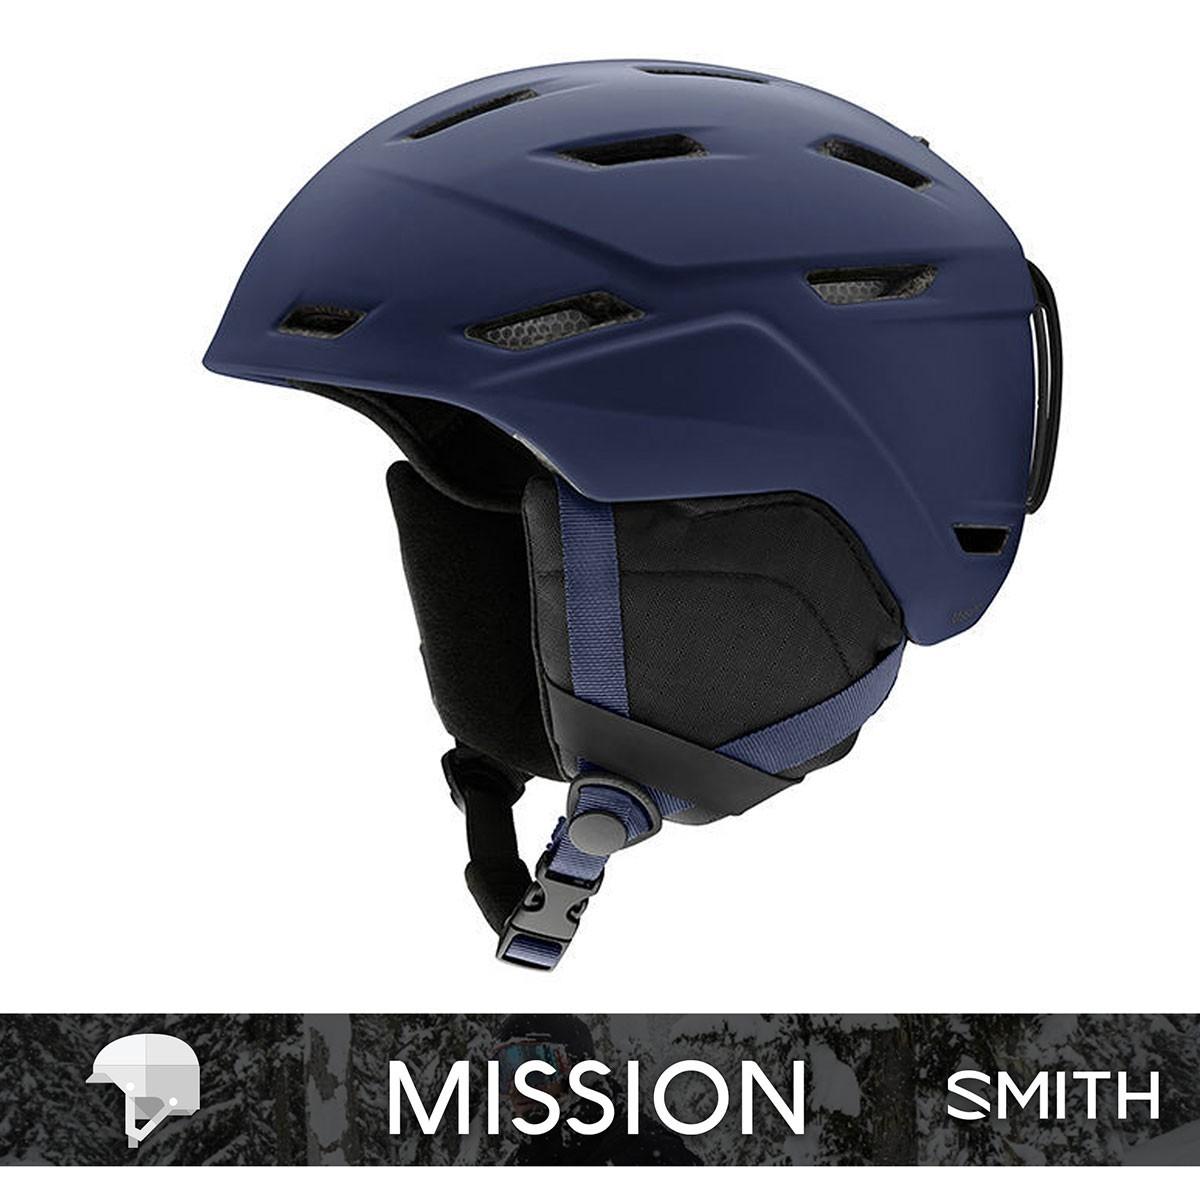 SMITH MISSION matte Ink - Изображение - AQUAMATRIX